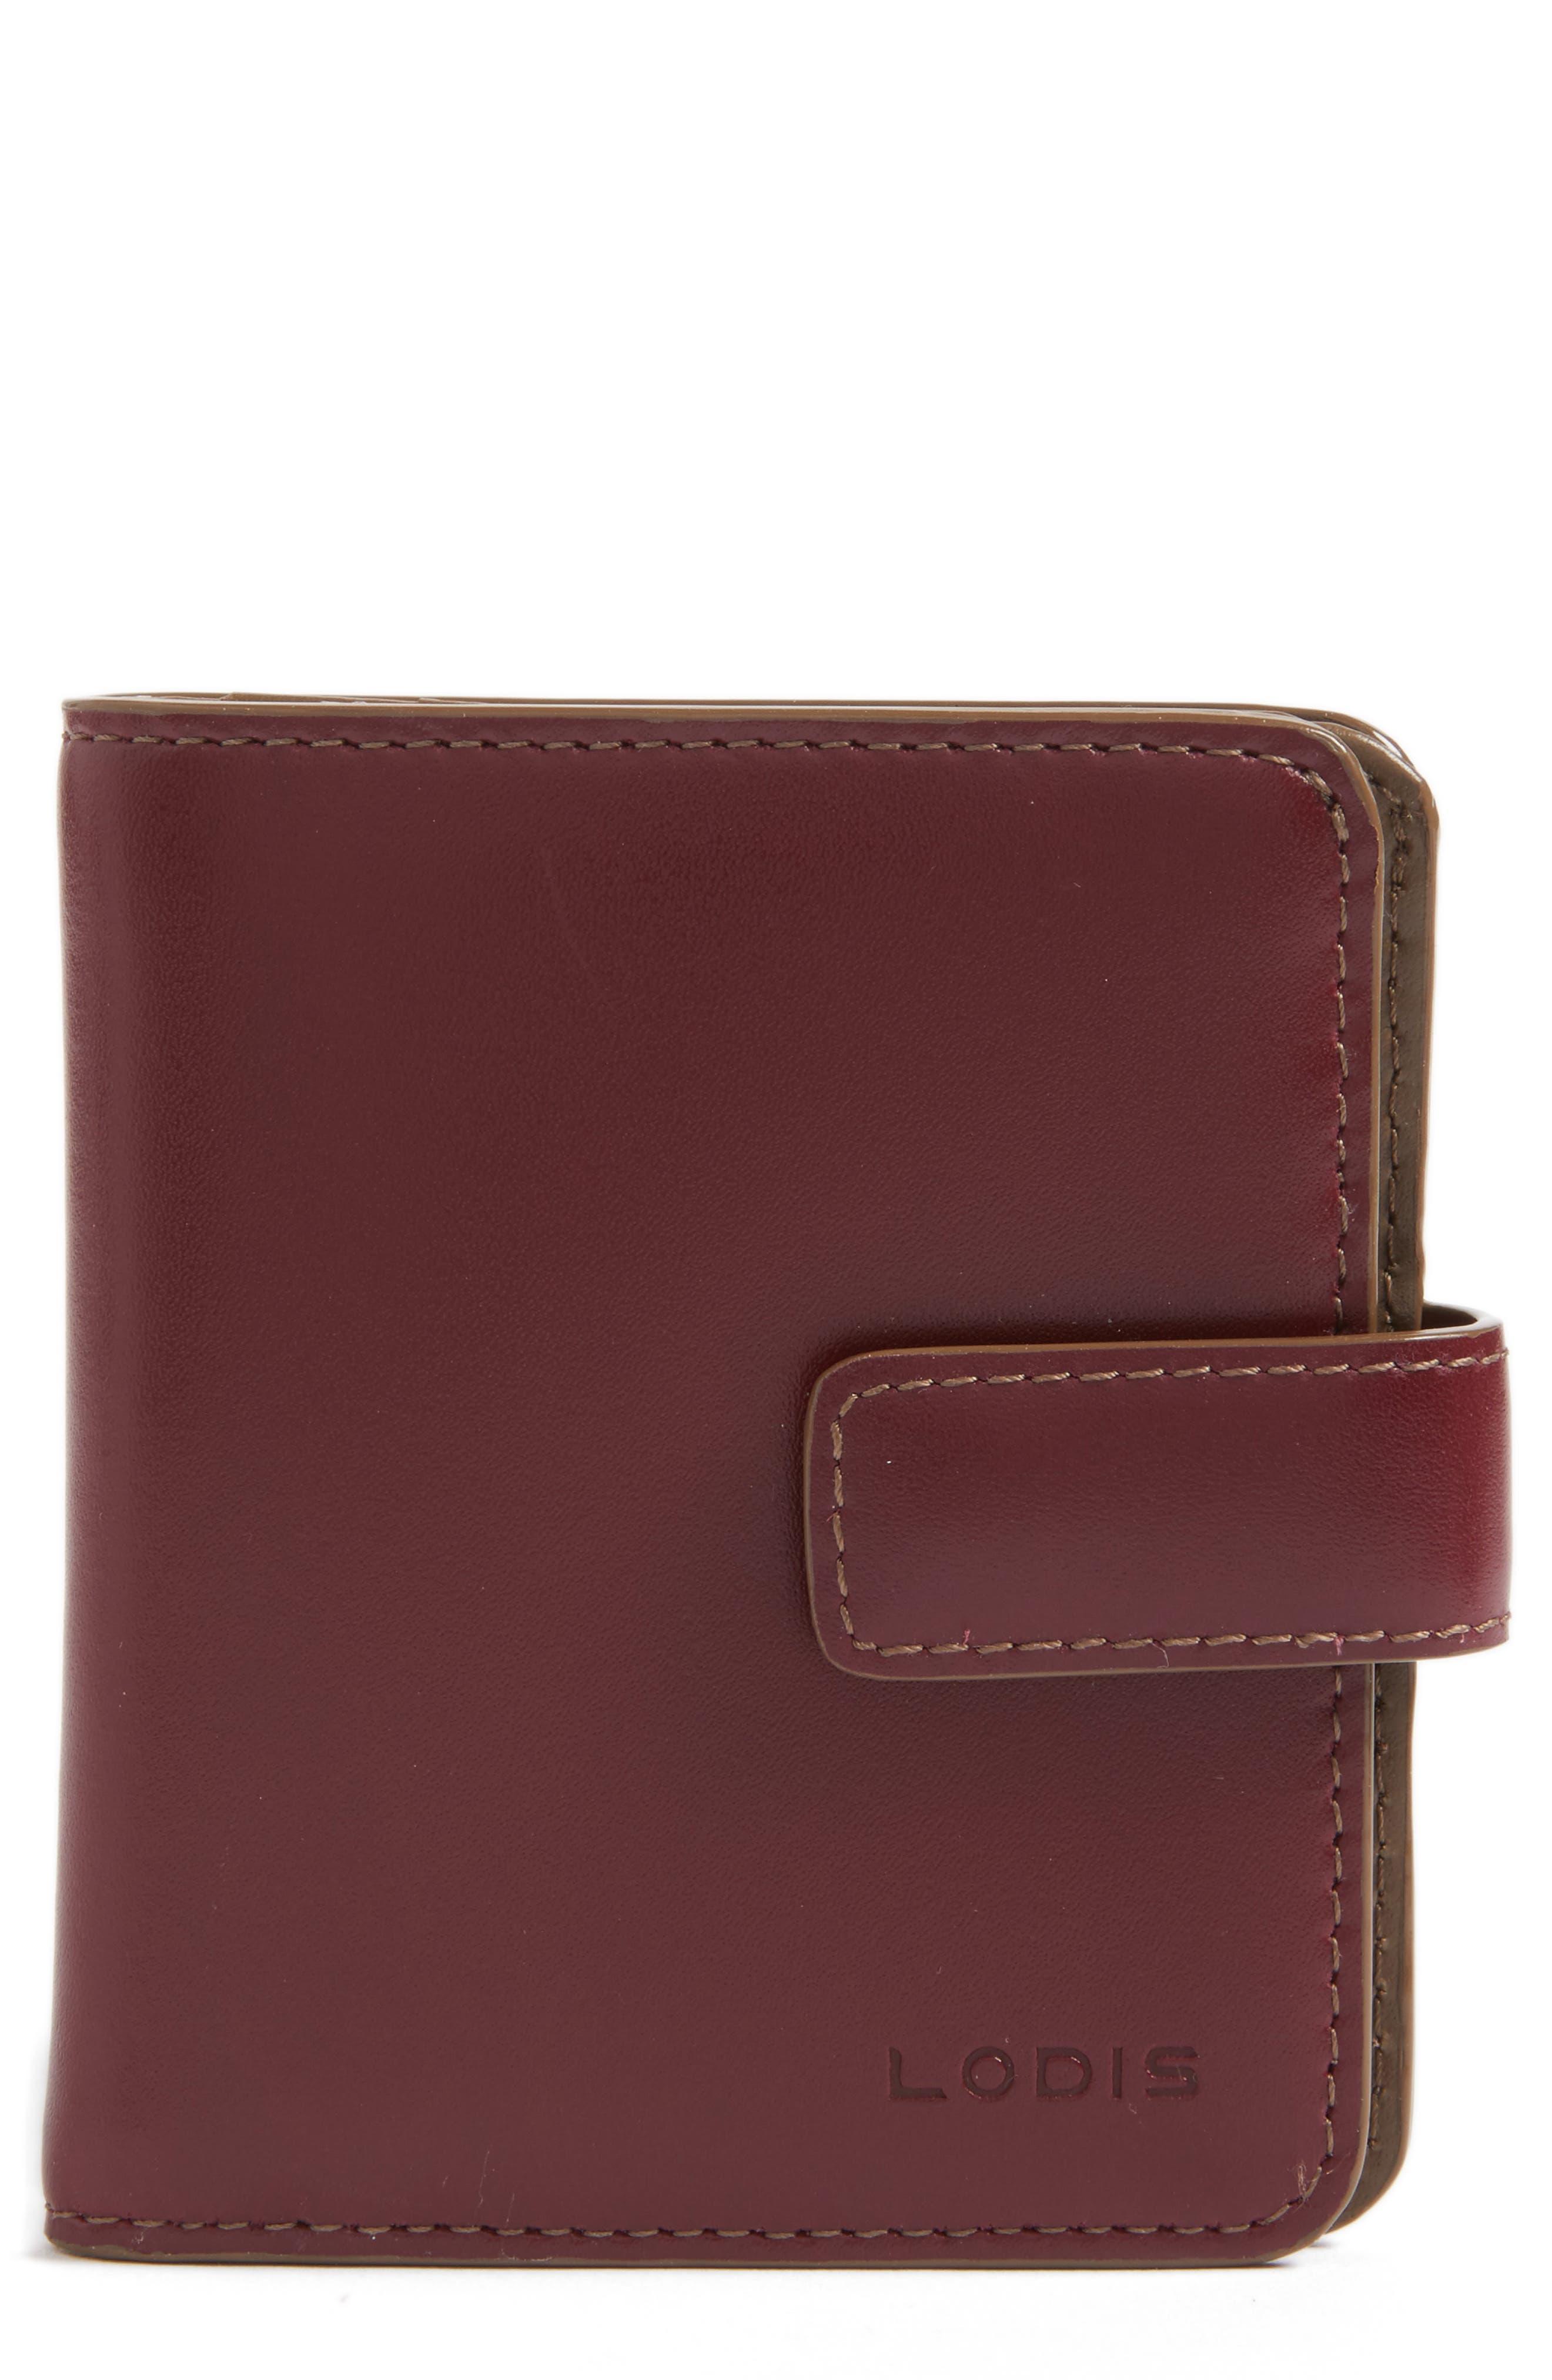 Lodis Petite Audrey RFID Leather Wallet,                             Main thumbnail 3, color,